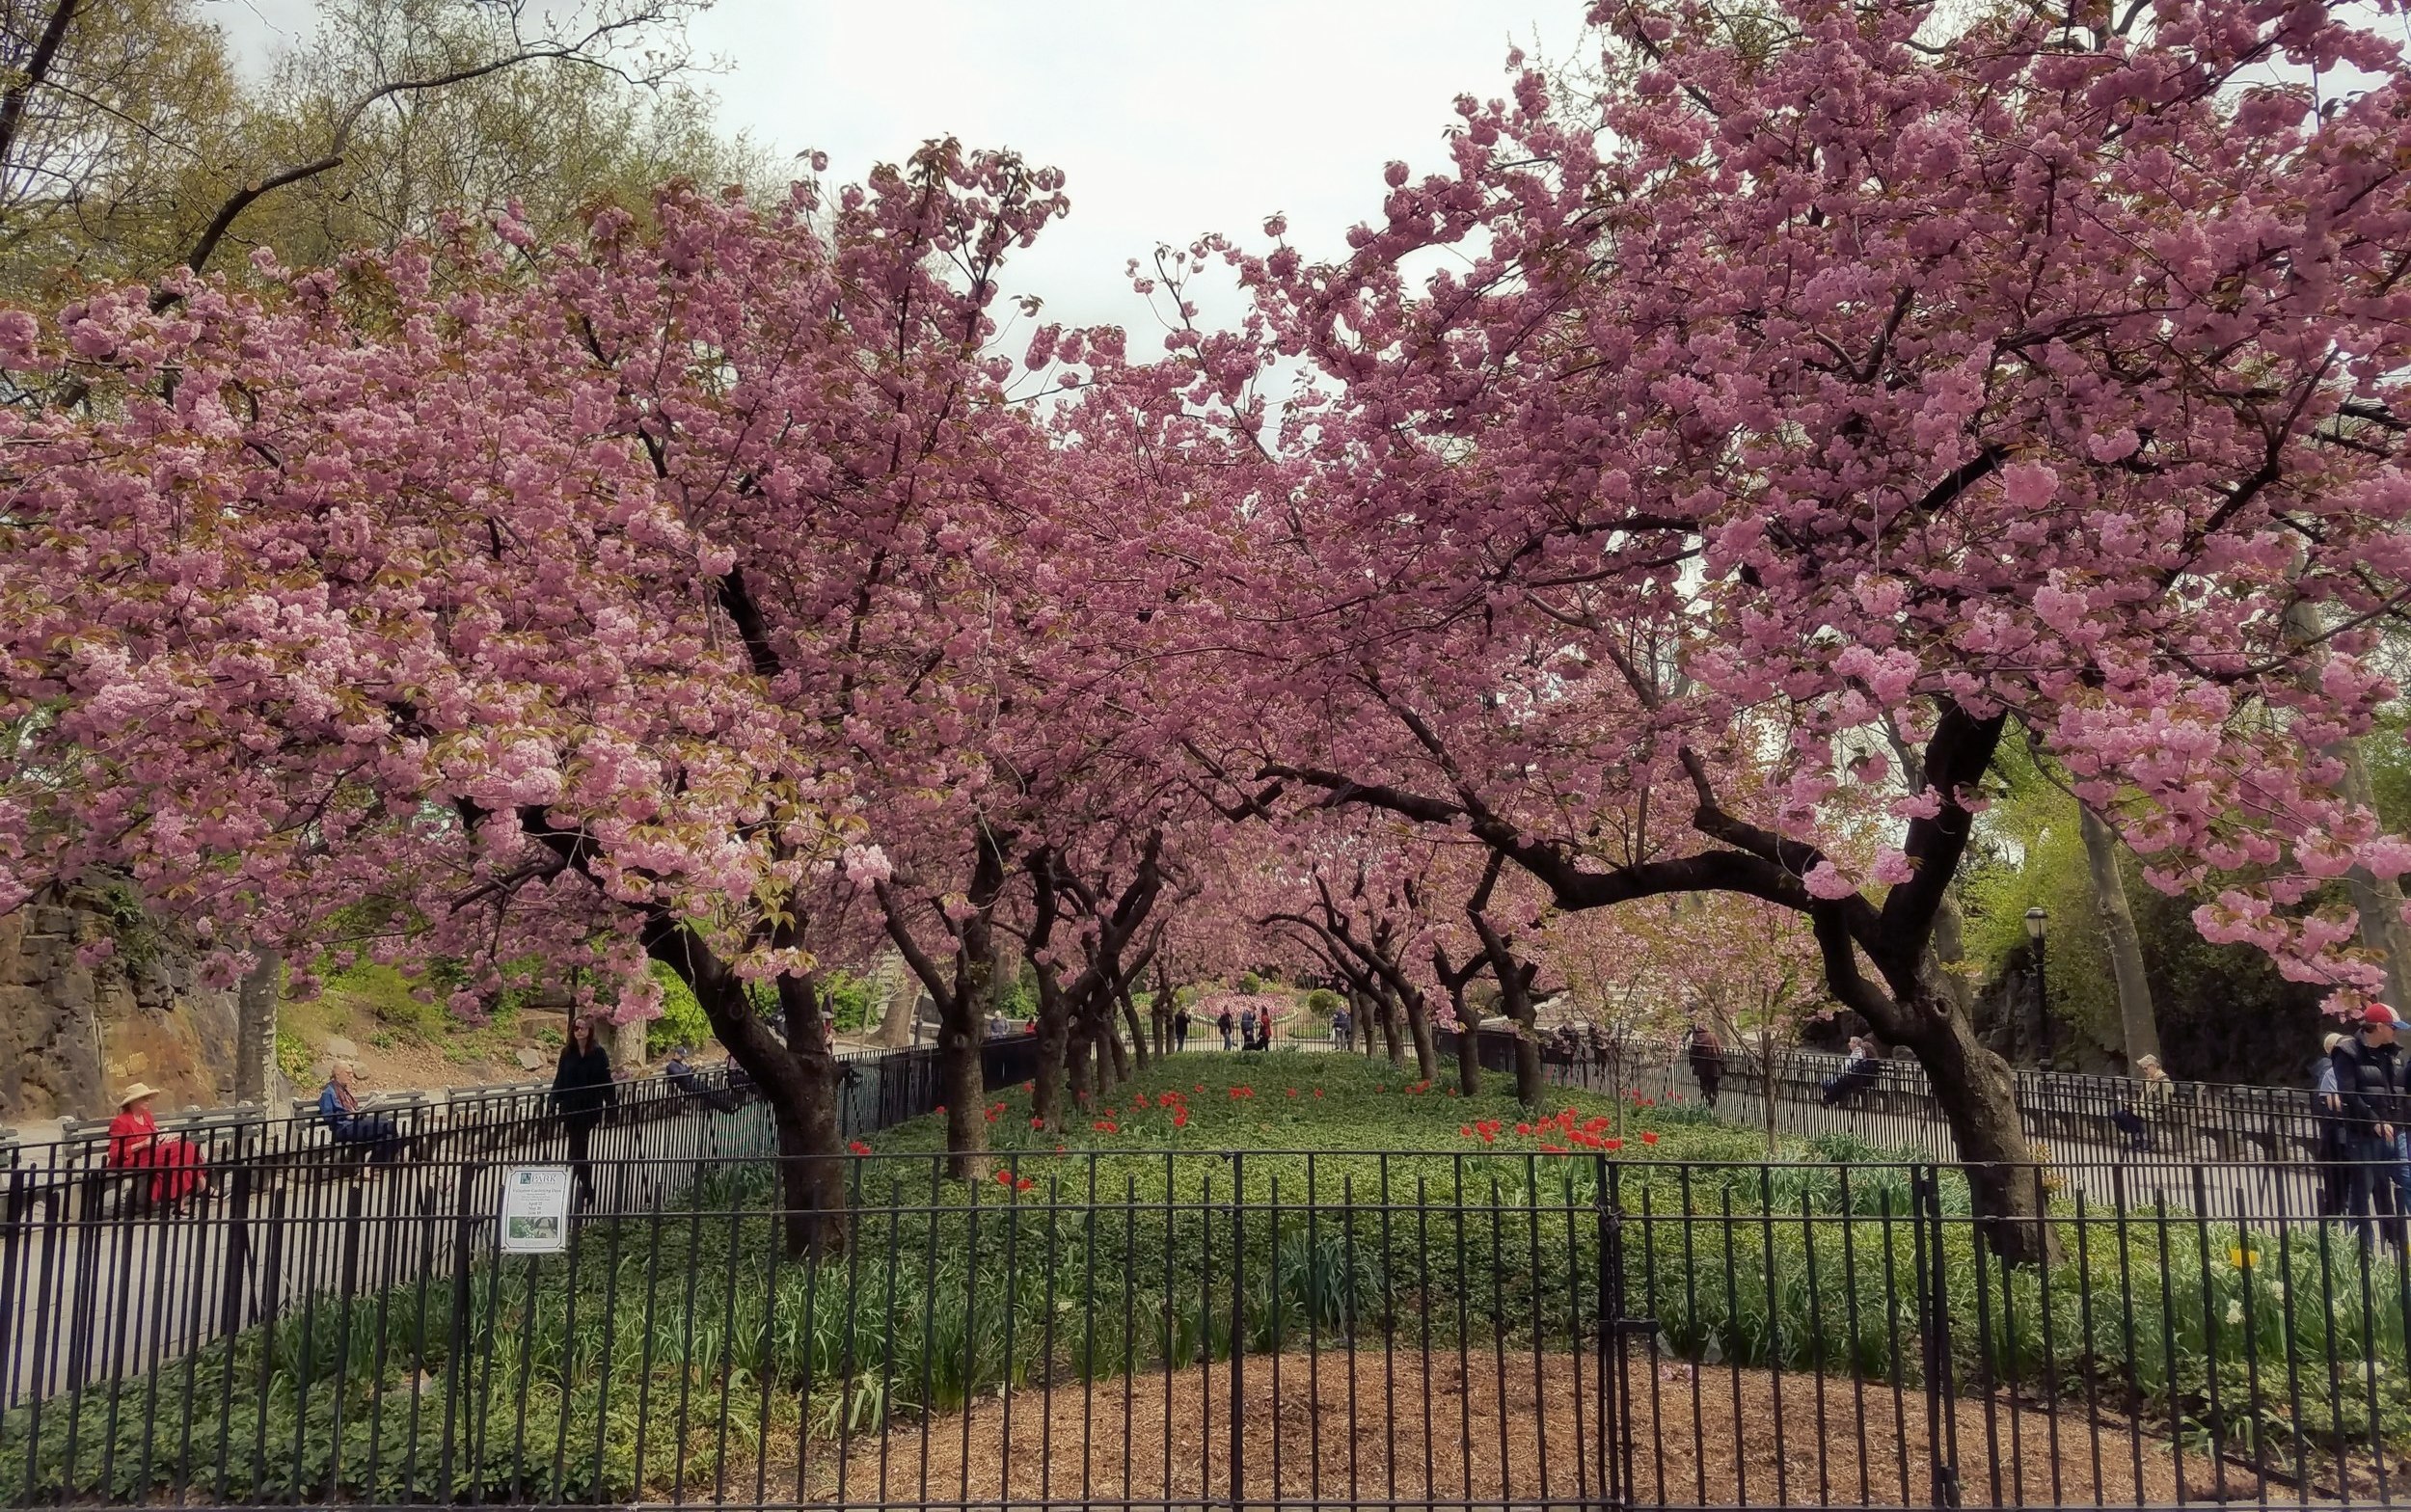 Dogwoods in bloom, Carl Shurz Park